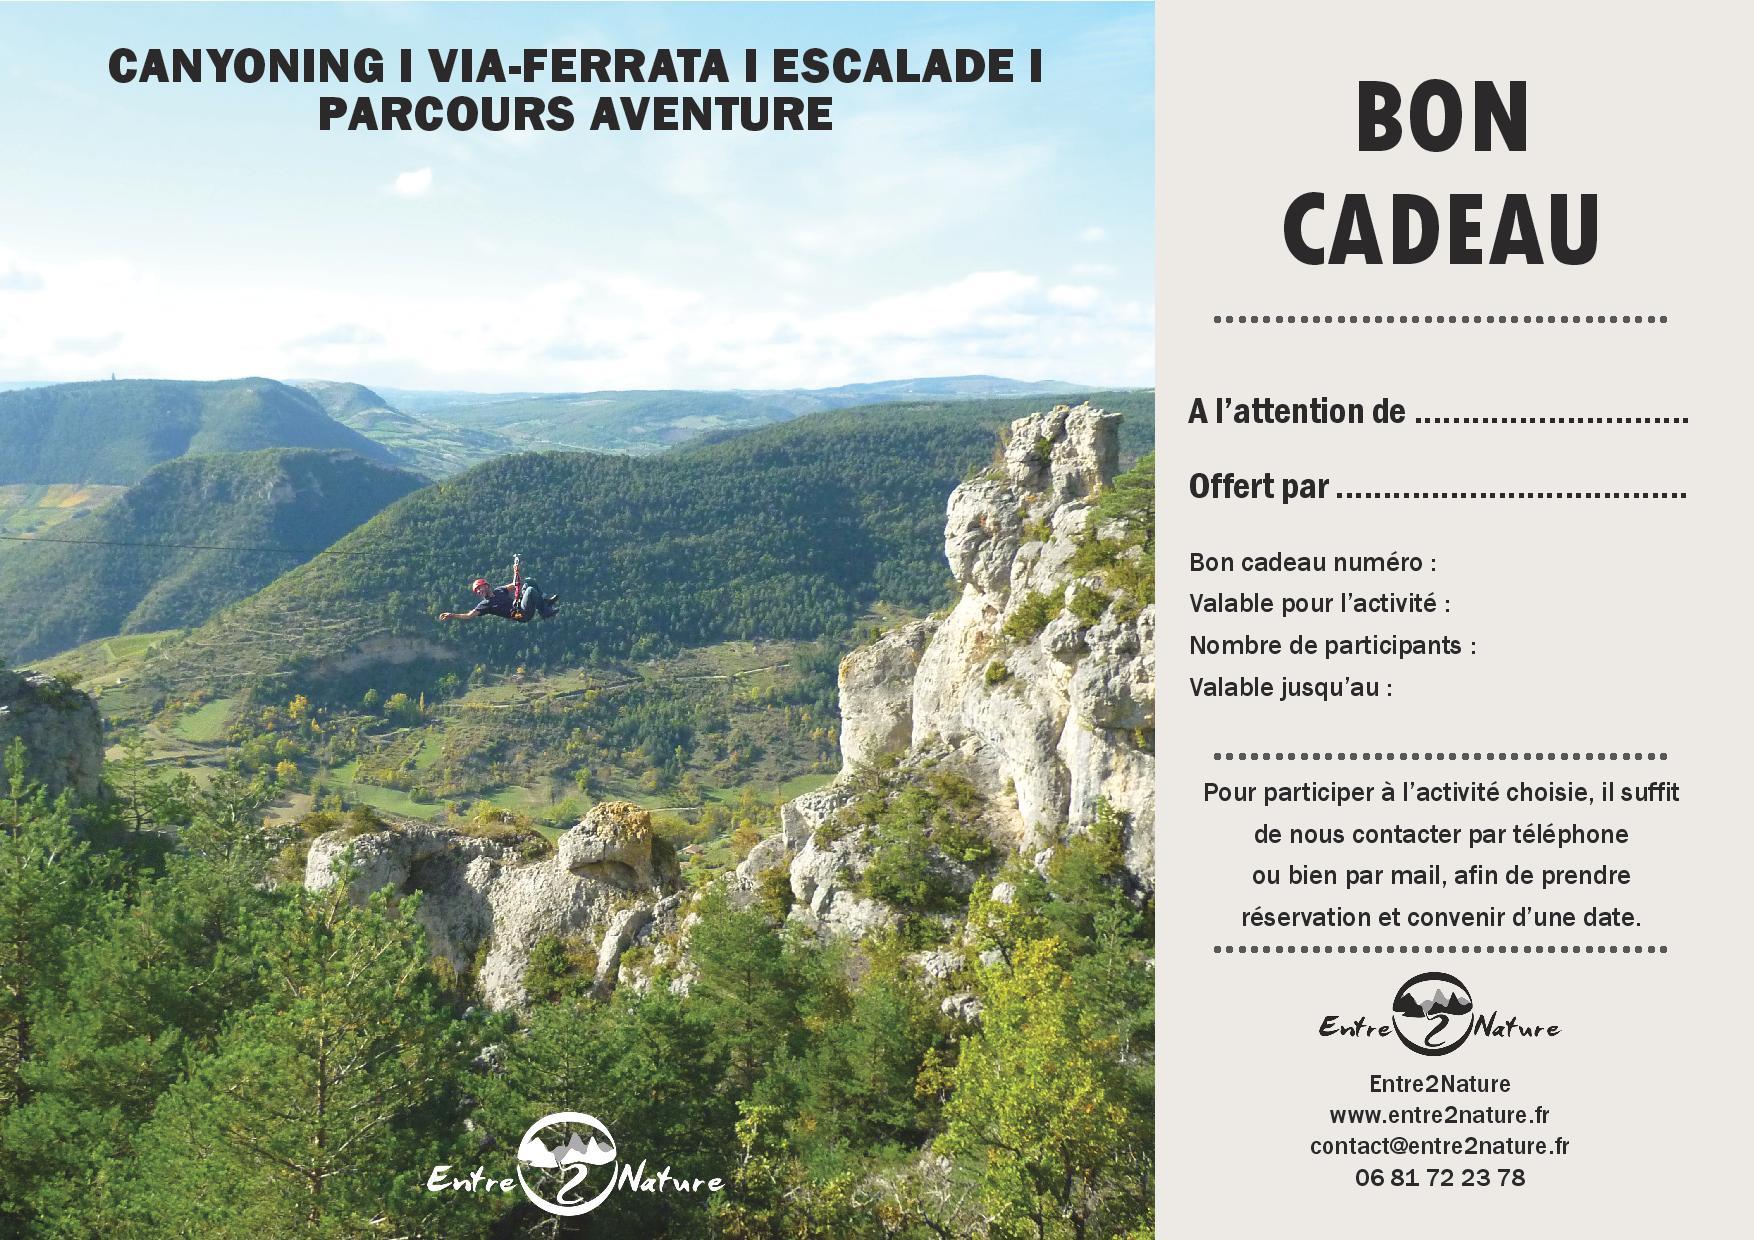 Bon Cadeau En Canyoning, Via-ferrata Et Escalade